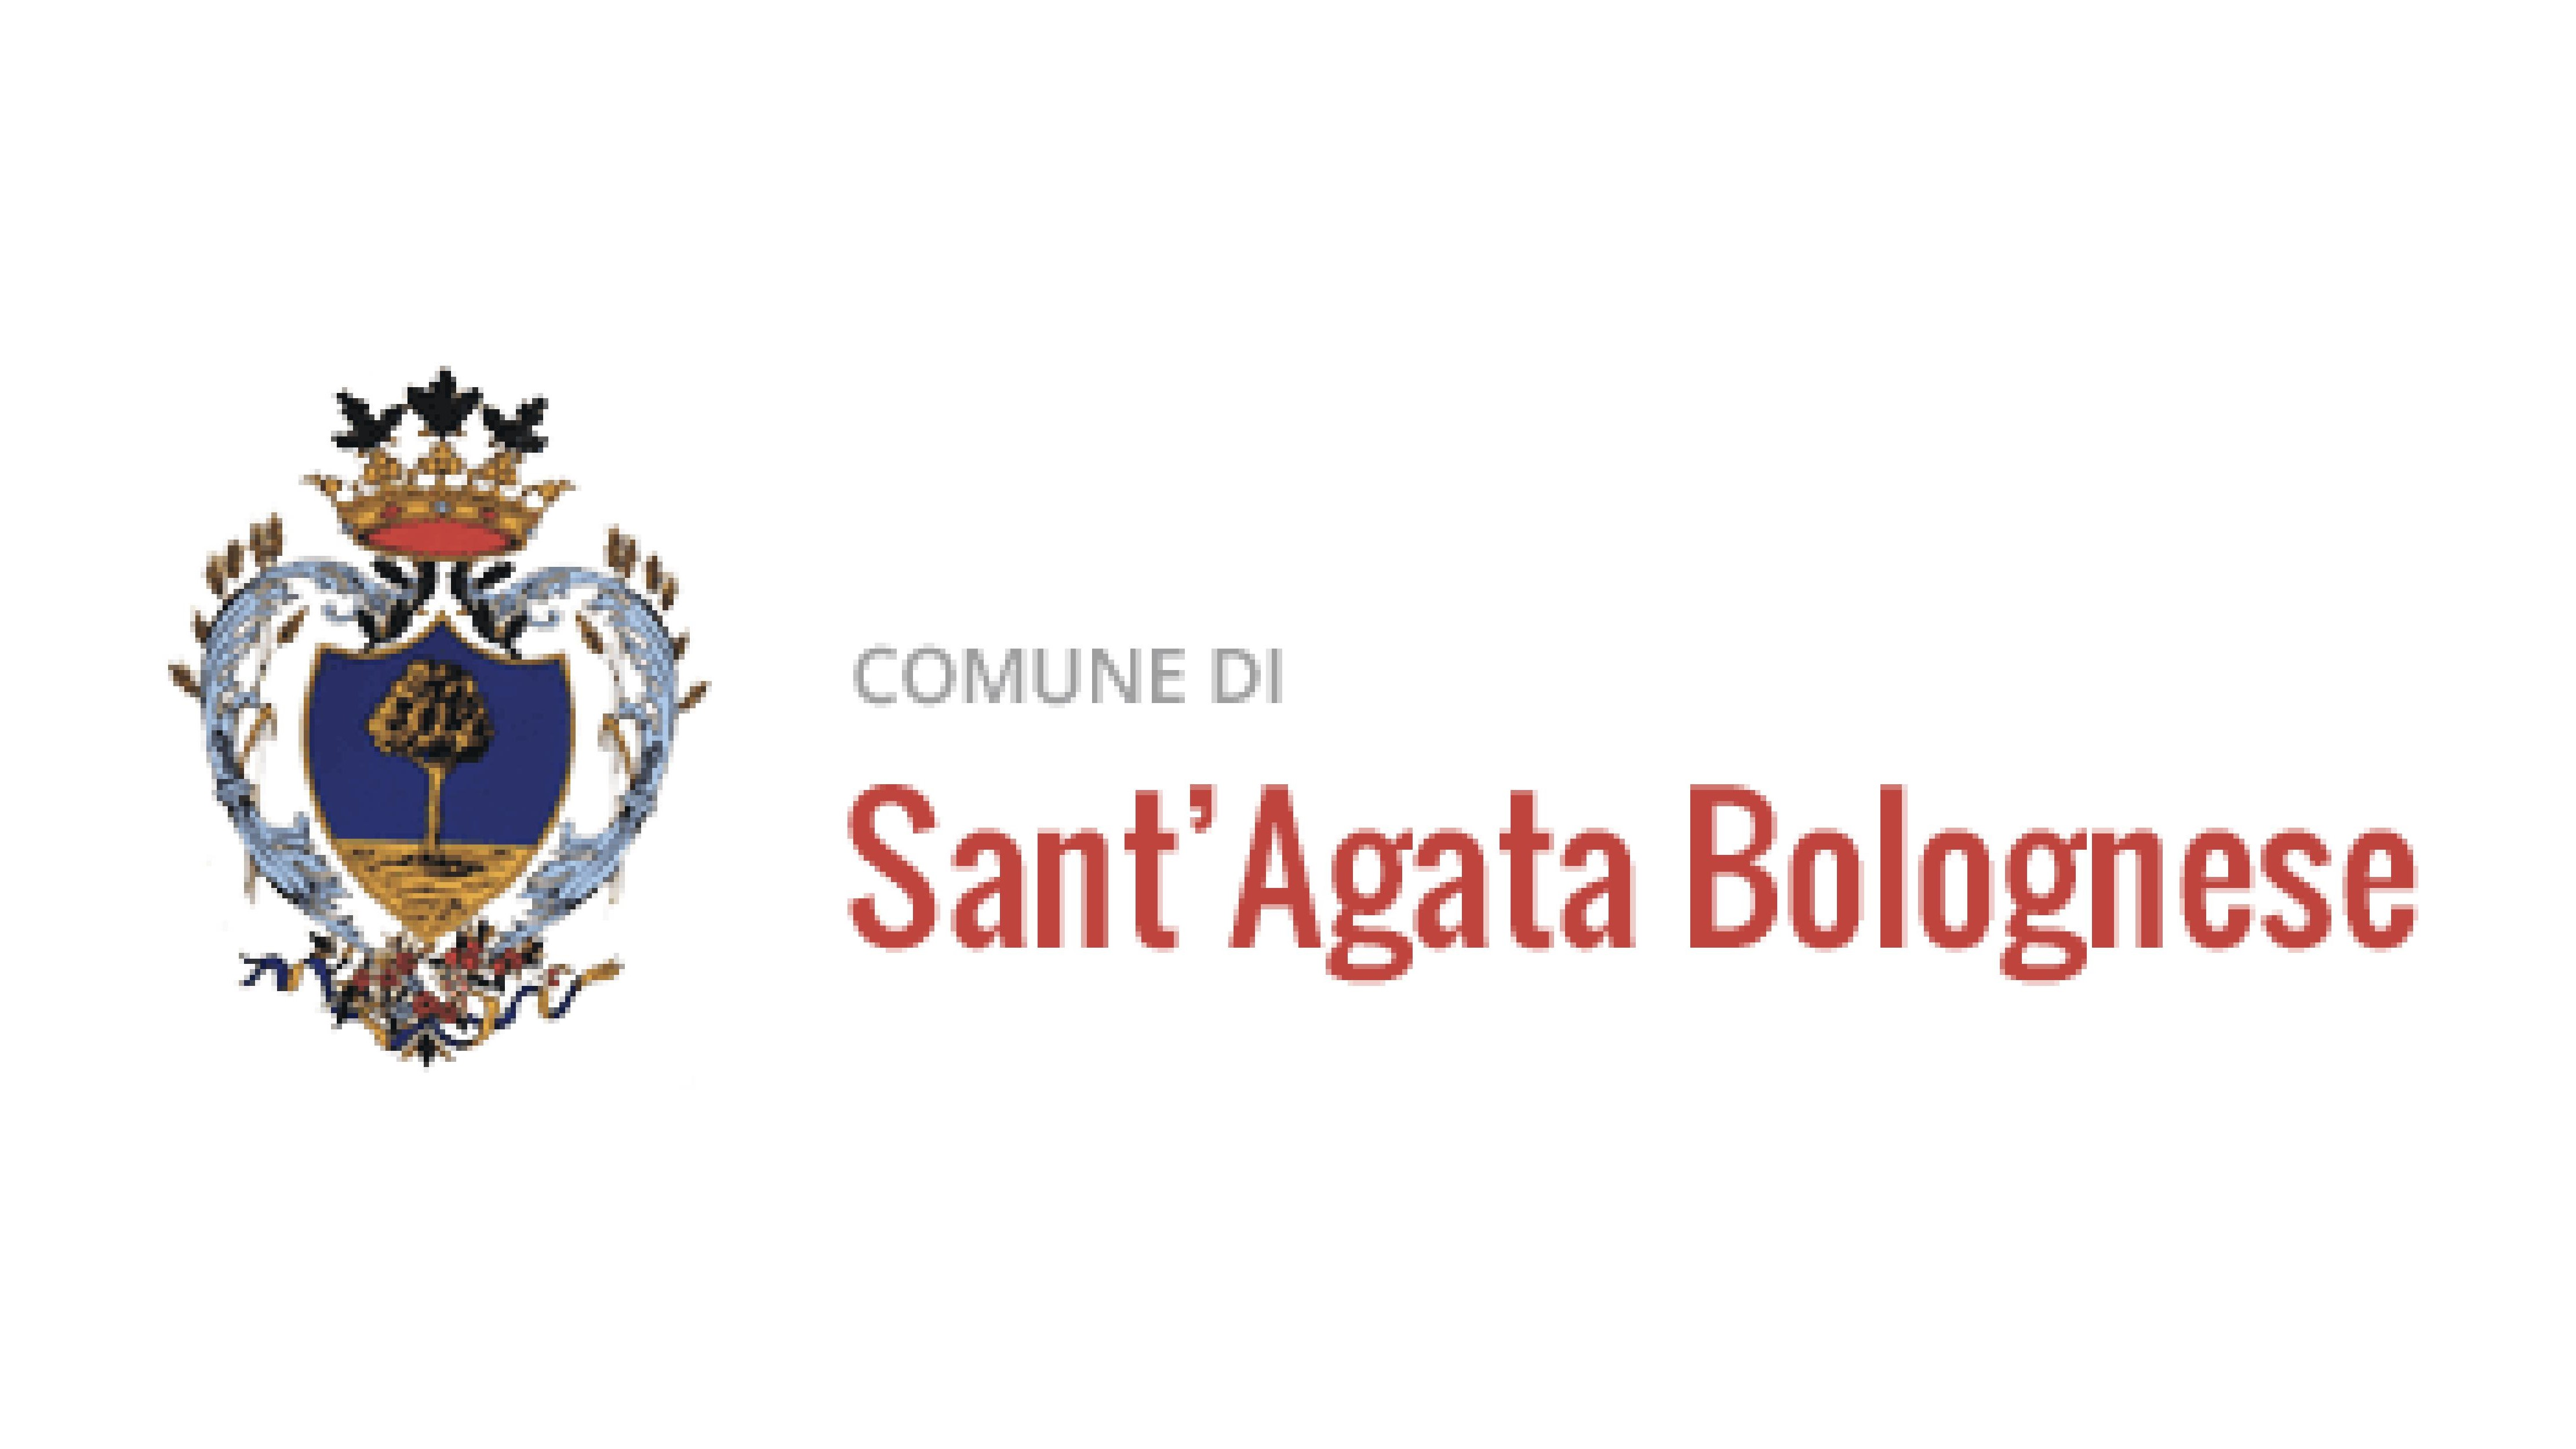 Comune Sant'Agata Bolognese